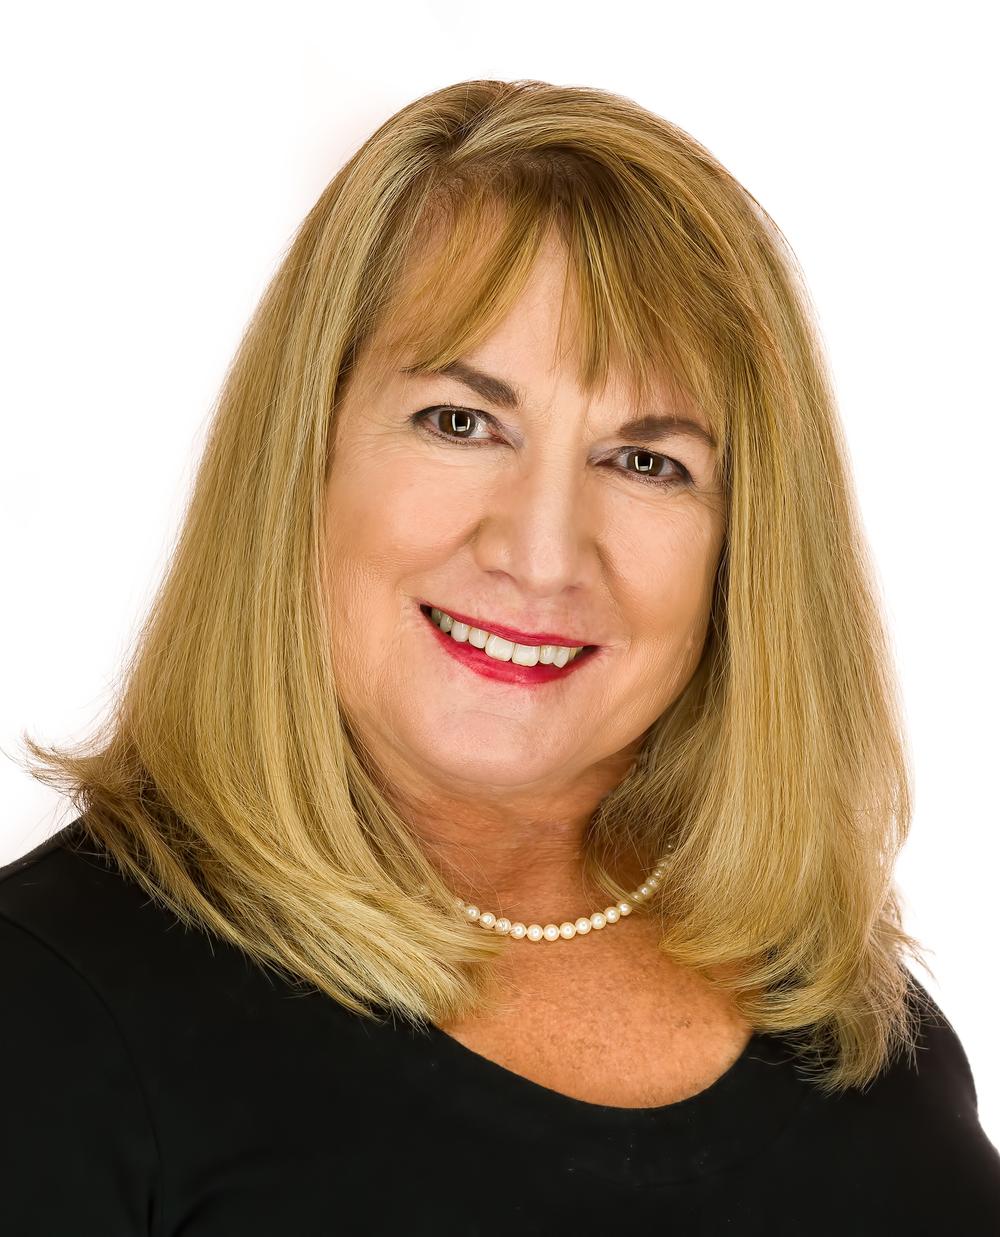 Pam Malloy   |   MA, NCC, PMHC, LPC